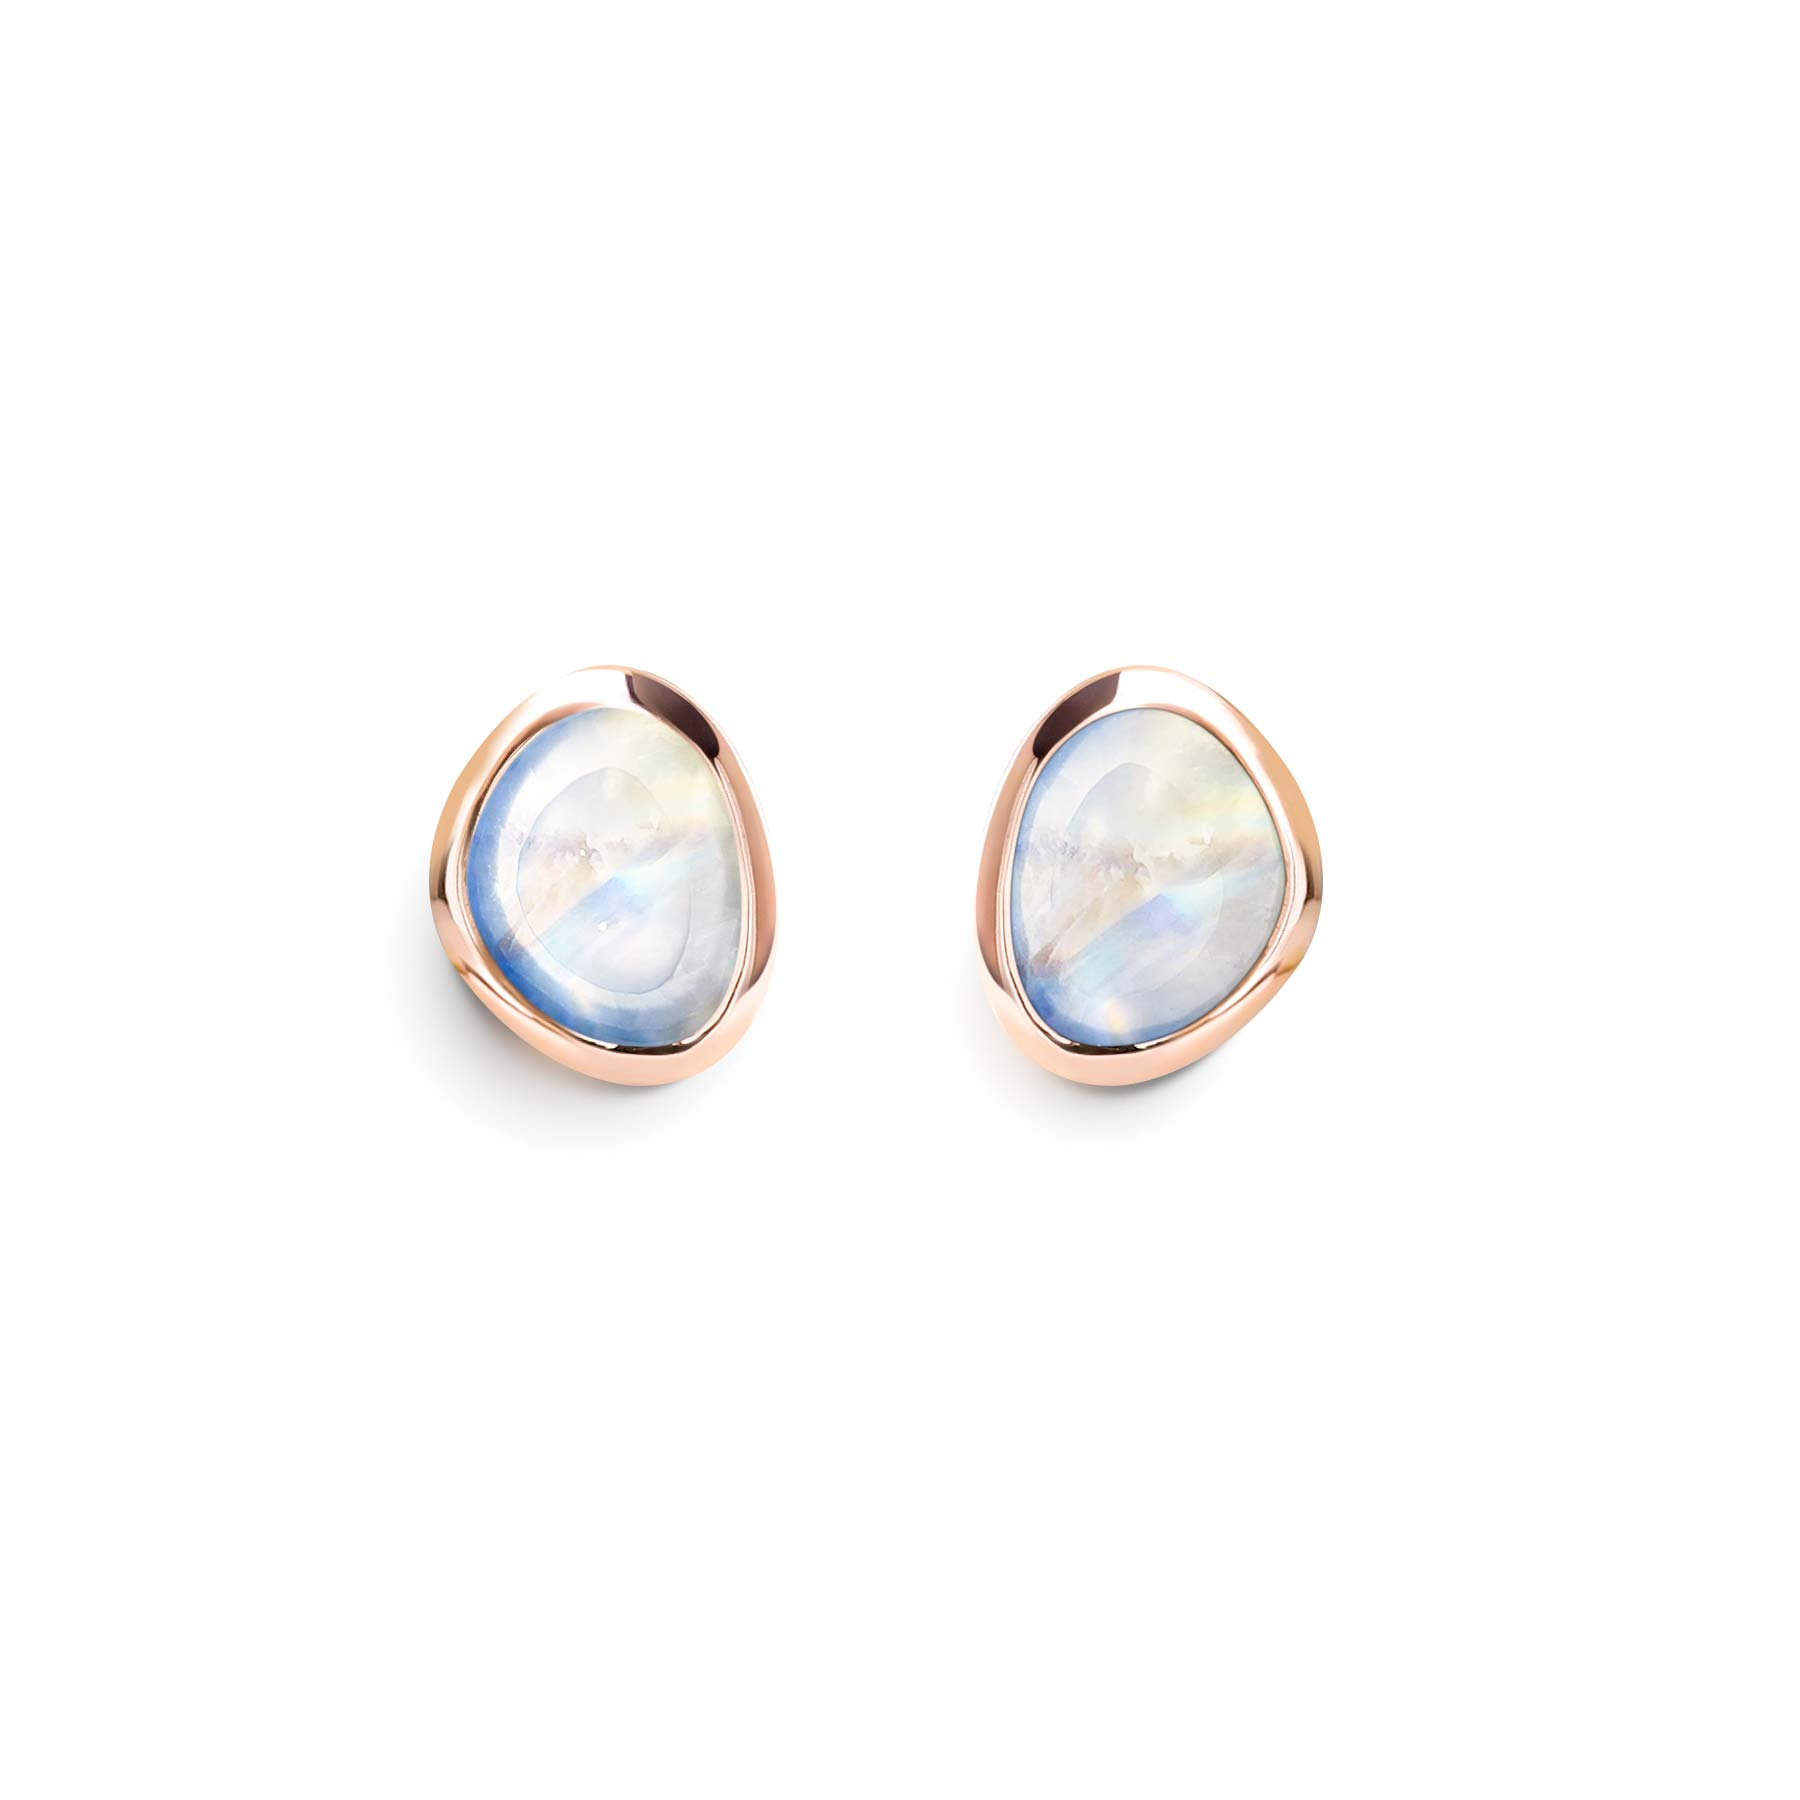 cbf9a5237 Alluressories | Minetta Mini Stud Earrings - Rose Gold - Moonstone